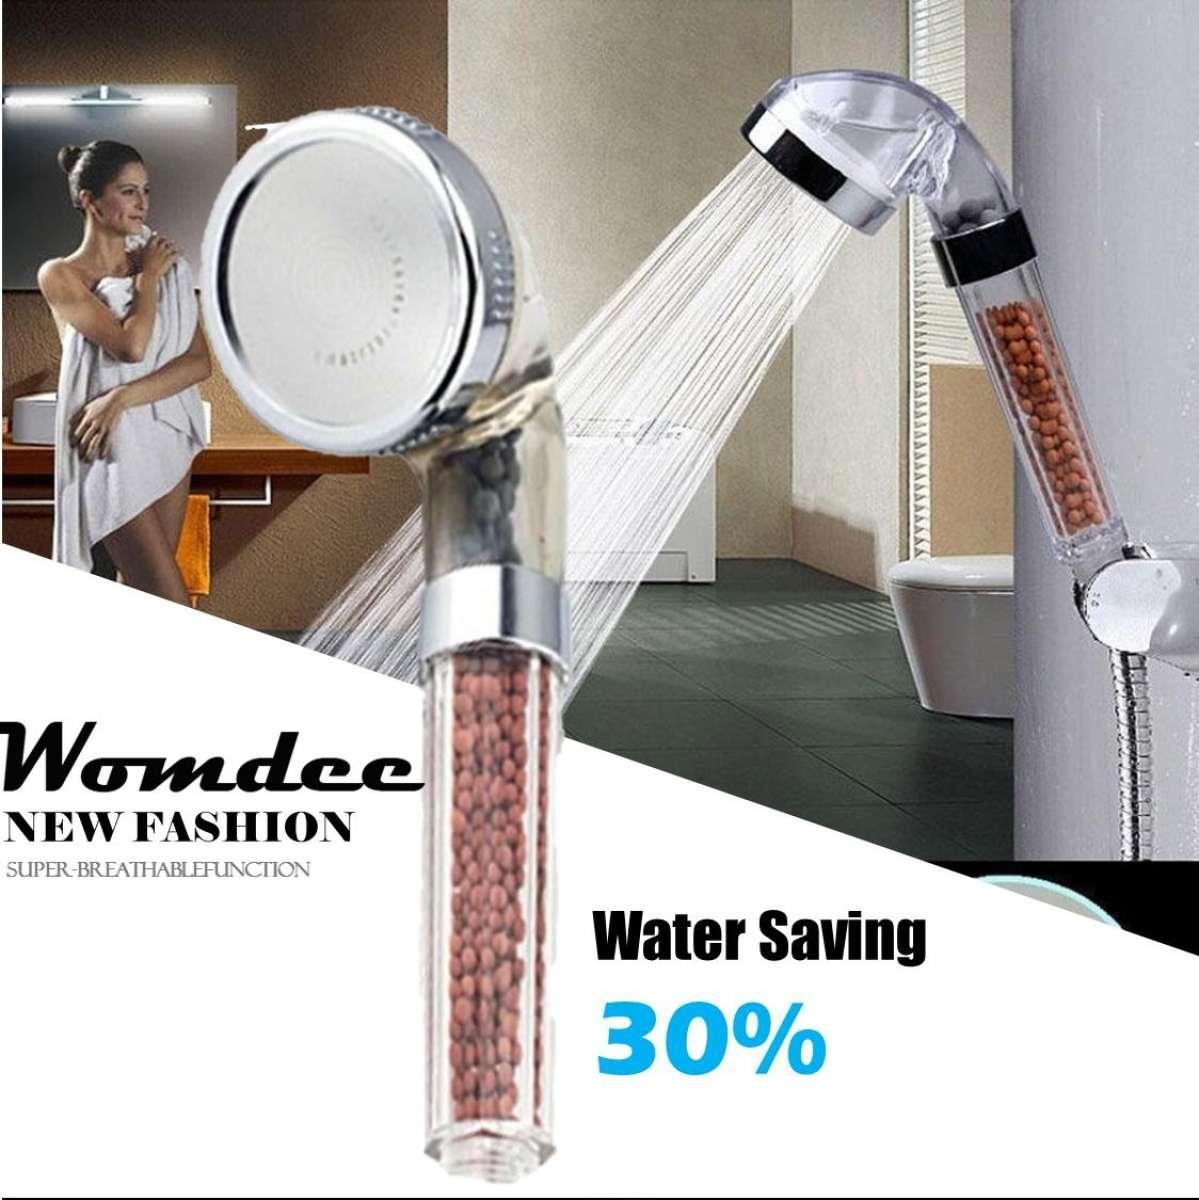 Womdee Bathroom Booster Spa Anion Water-Saving Handheld Rain Shower Spray Head Nozzle,6cm - Intl By Womdee.